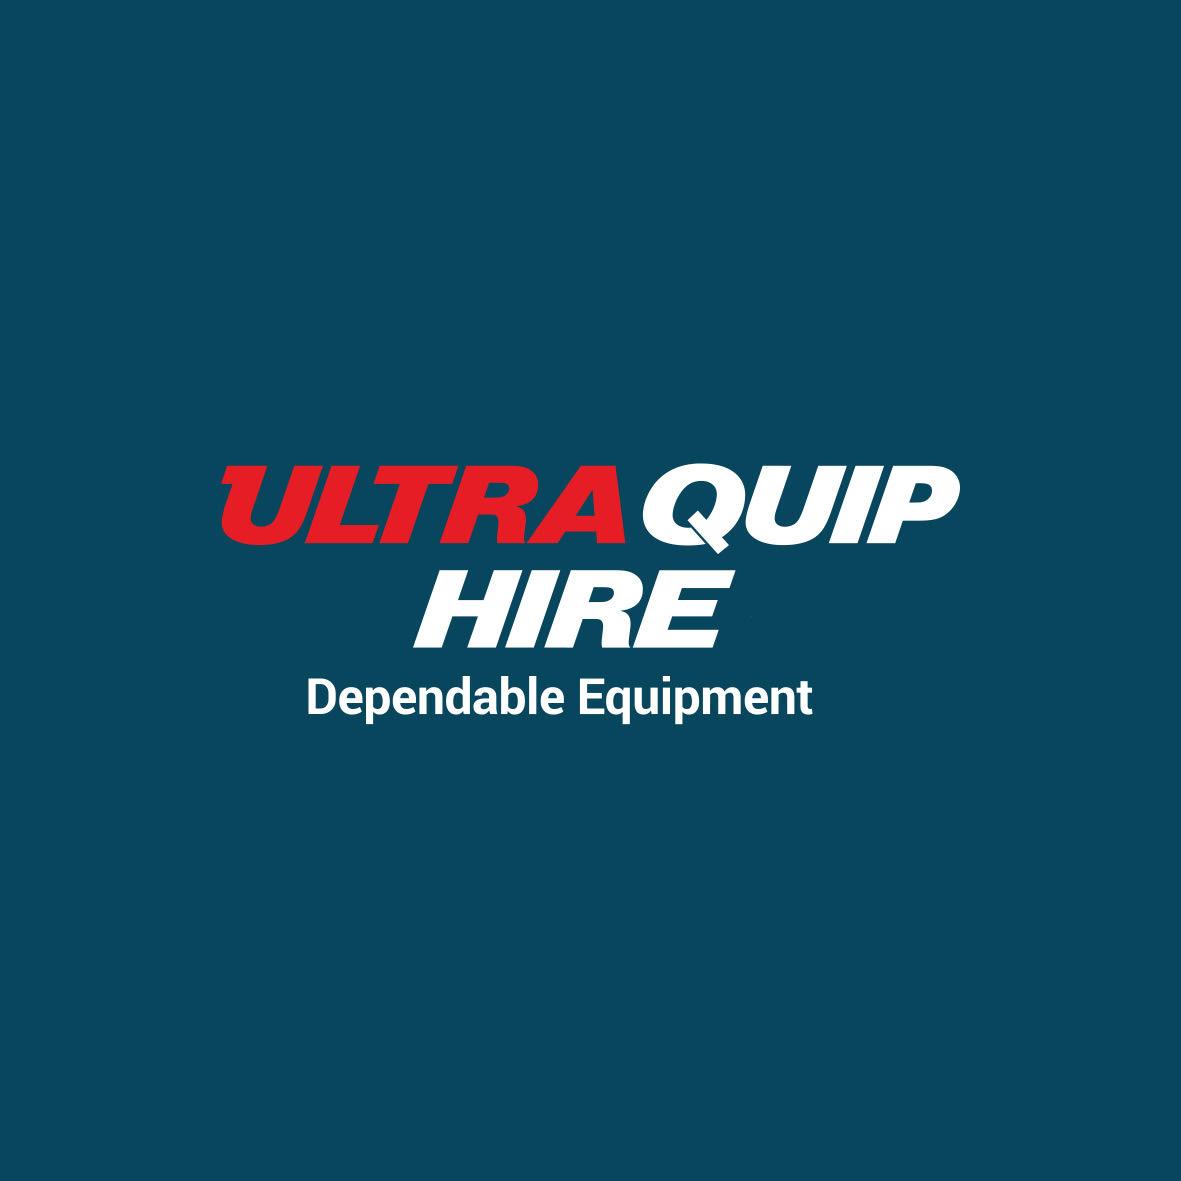 ultraquip logo.jpg